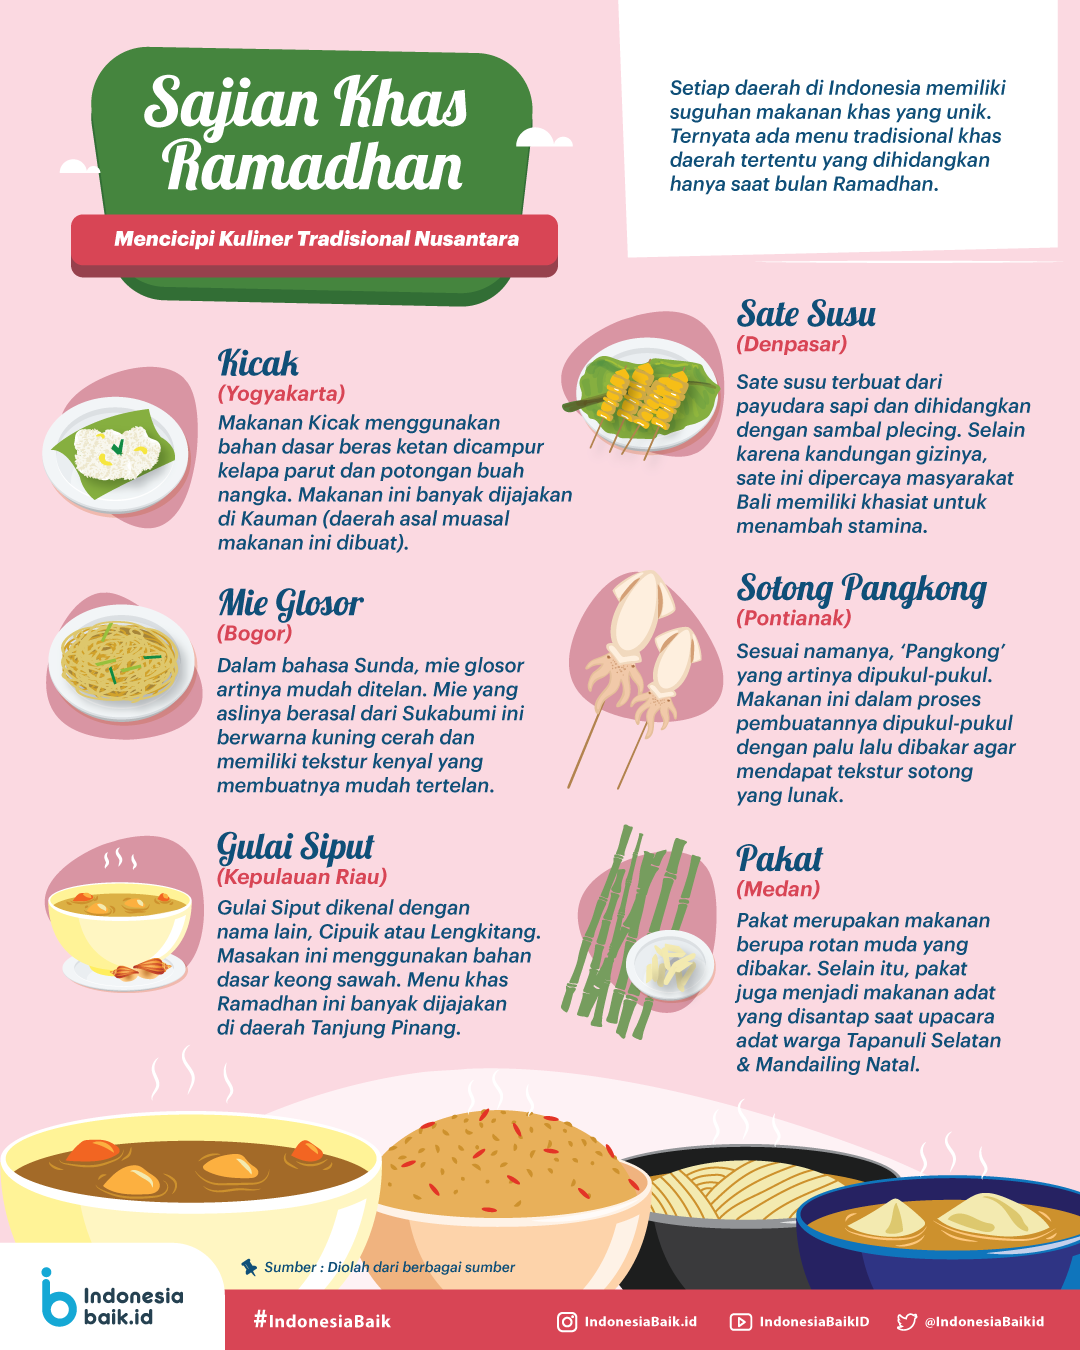 Makanan Khas Saat Ramadhan Indonesia Baik Ide Makanan Makanan Infografis